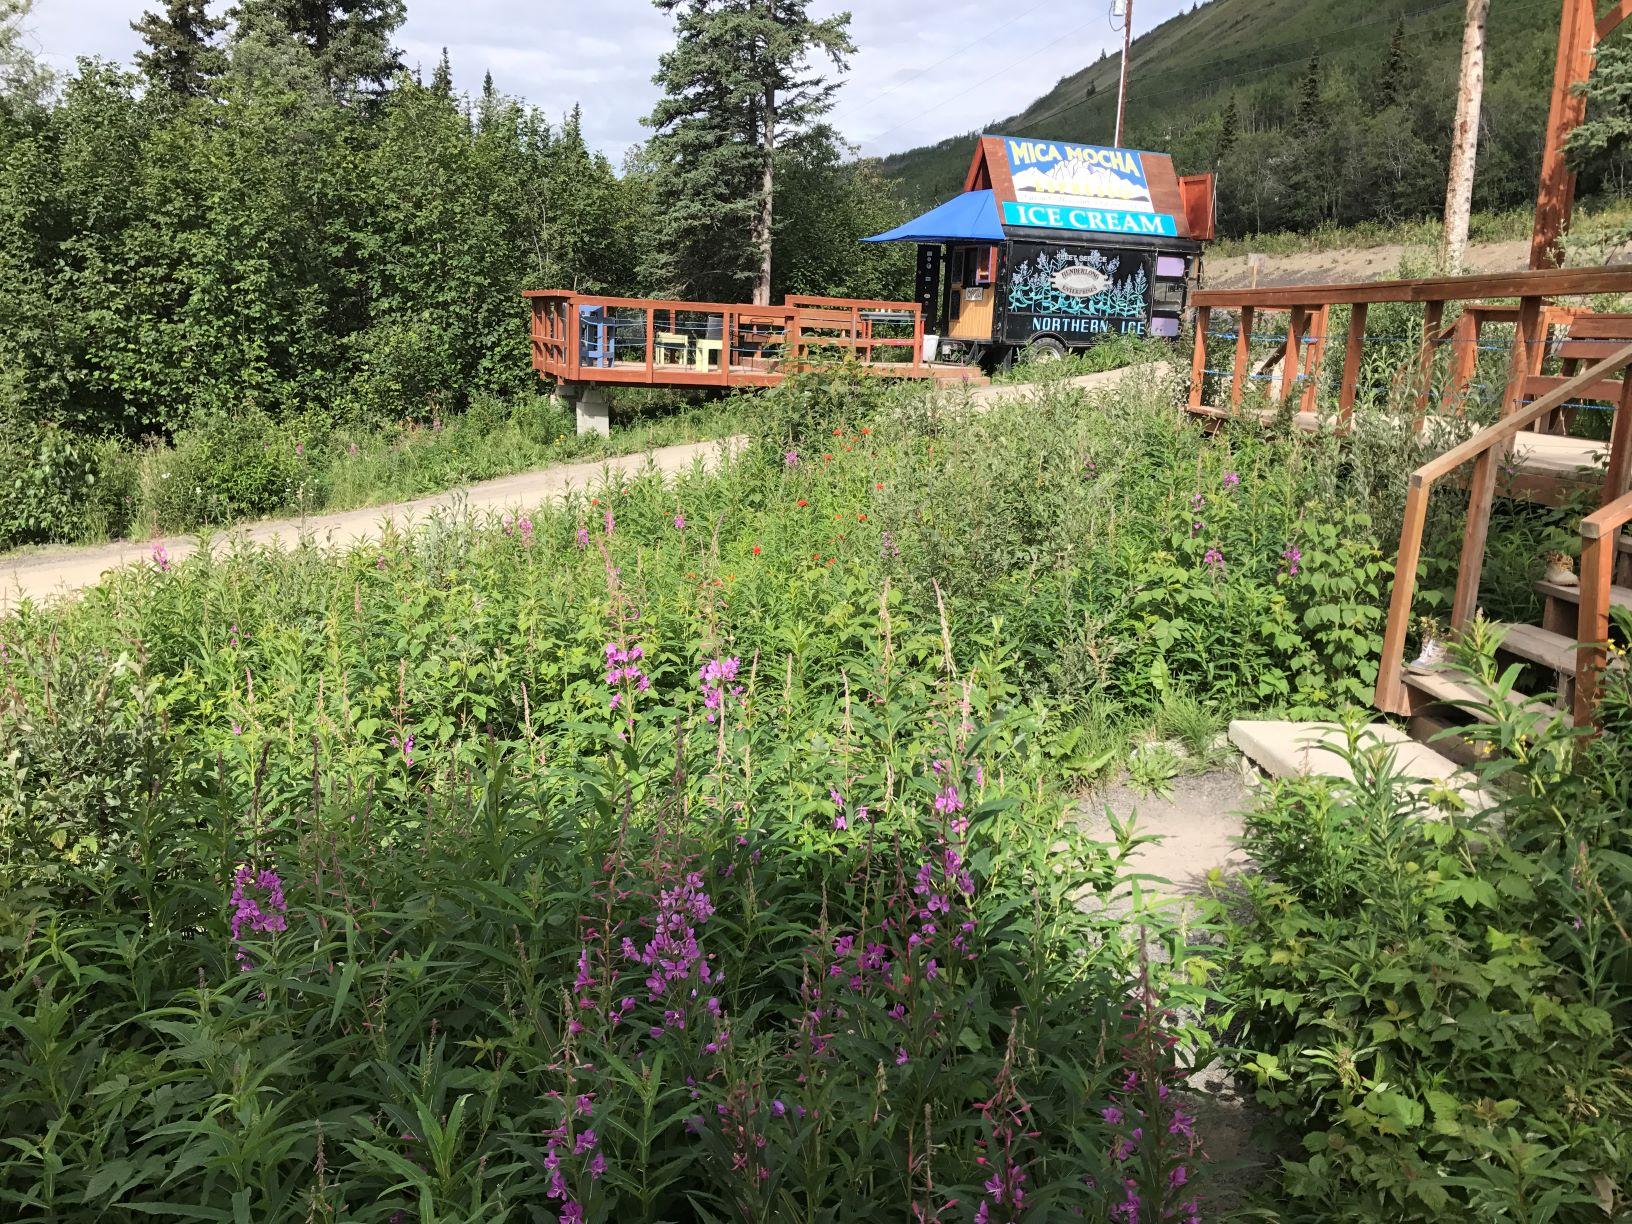 Alaska fireweed and MICA Mocha